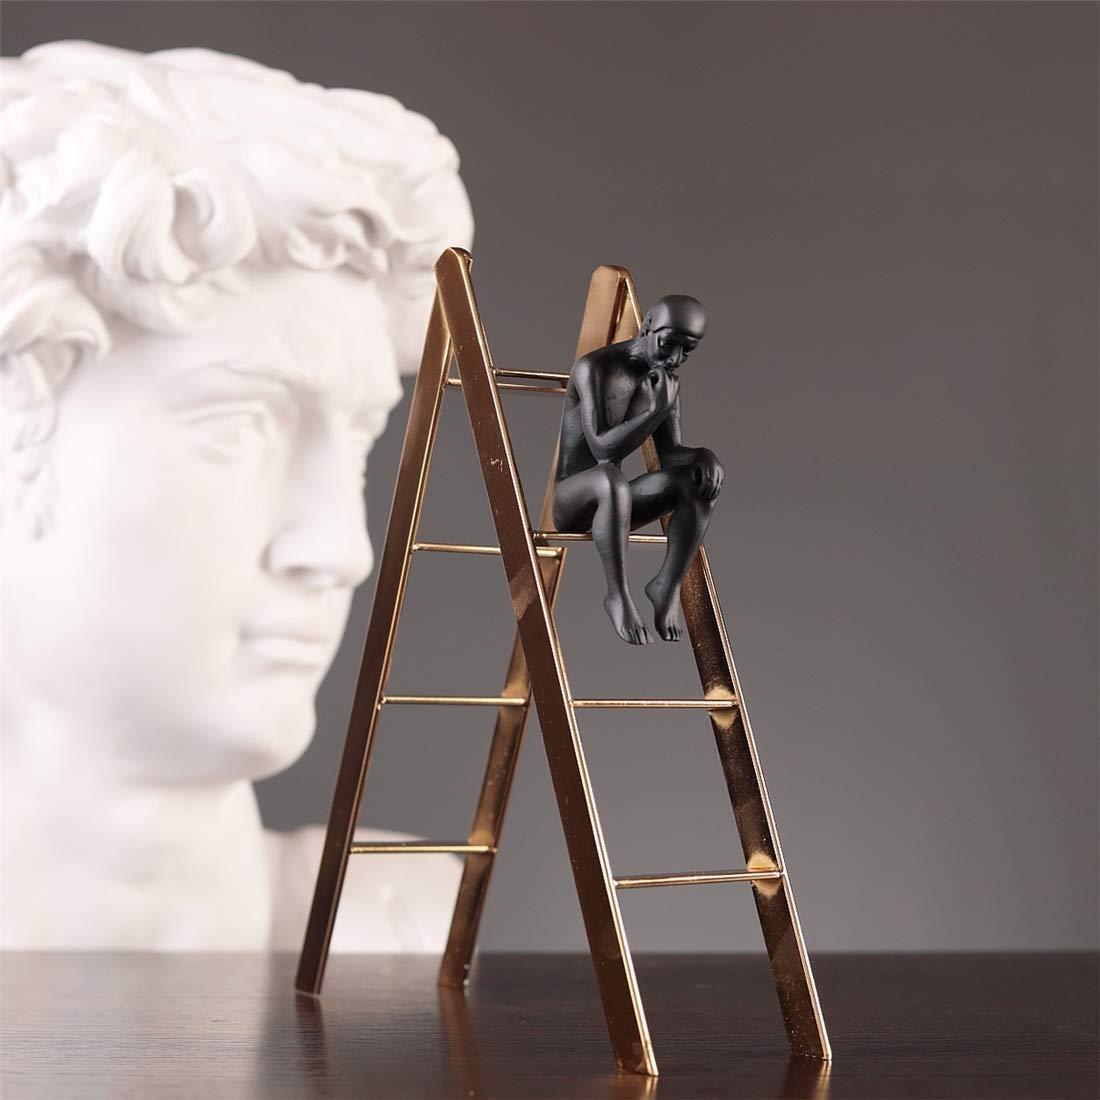 KSW_KKW Hombre Negro Escalera Estatua Figuras de Resina Escultura Obra Inicio Mesa Gabinete Decoración de Arte Figuras de Escritorio Modernas: Amazon.es: Hogar